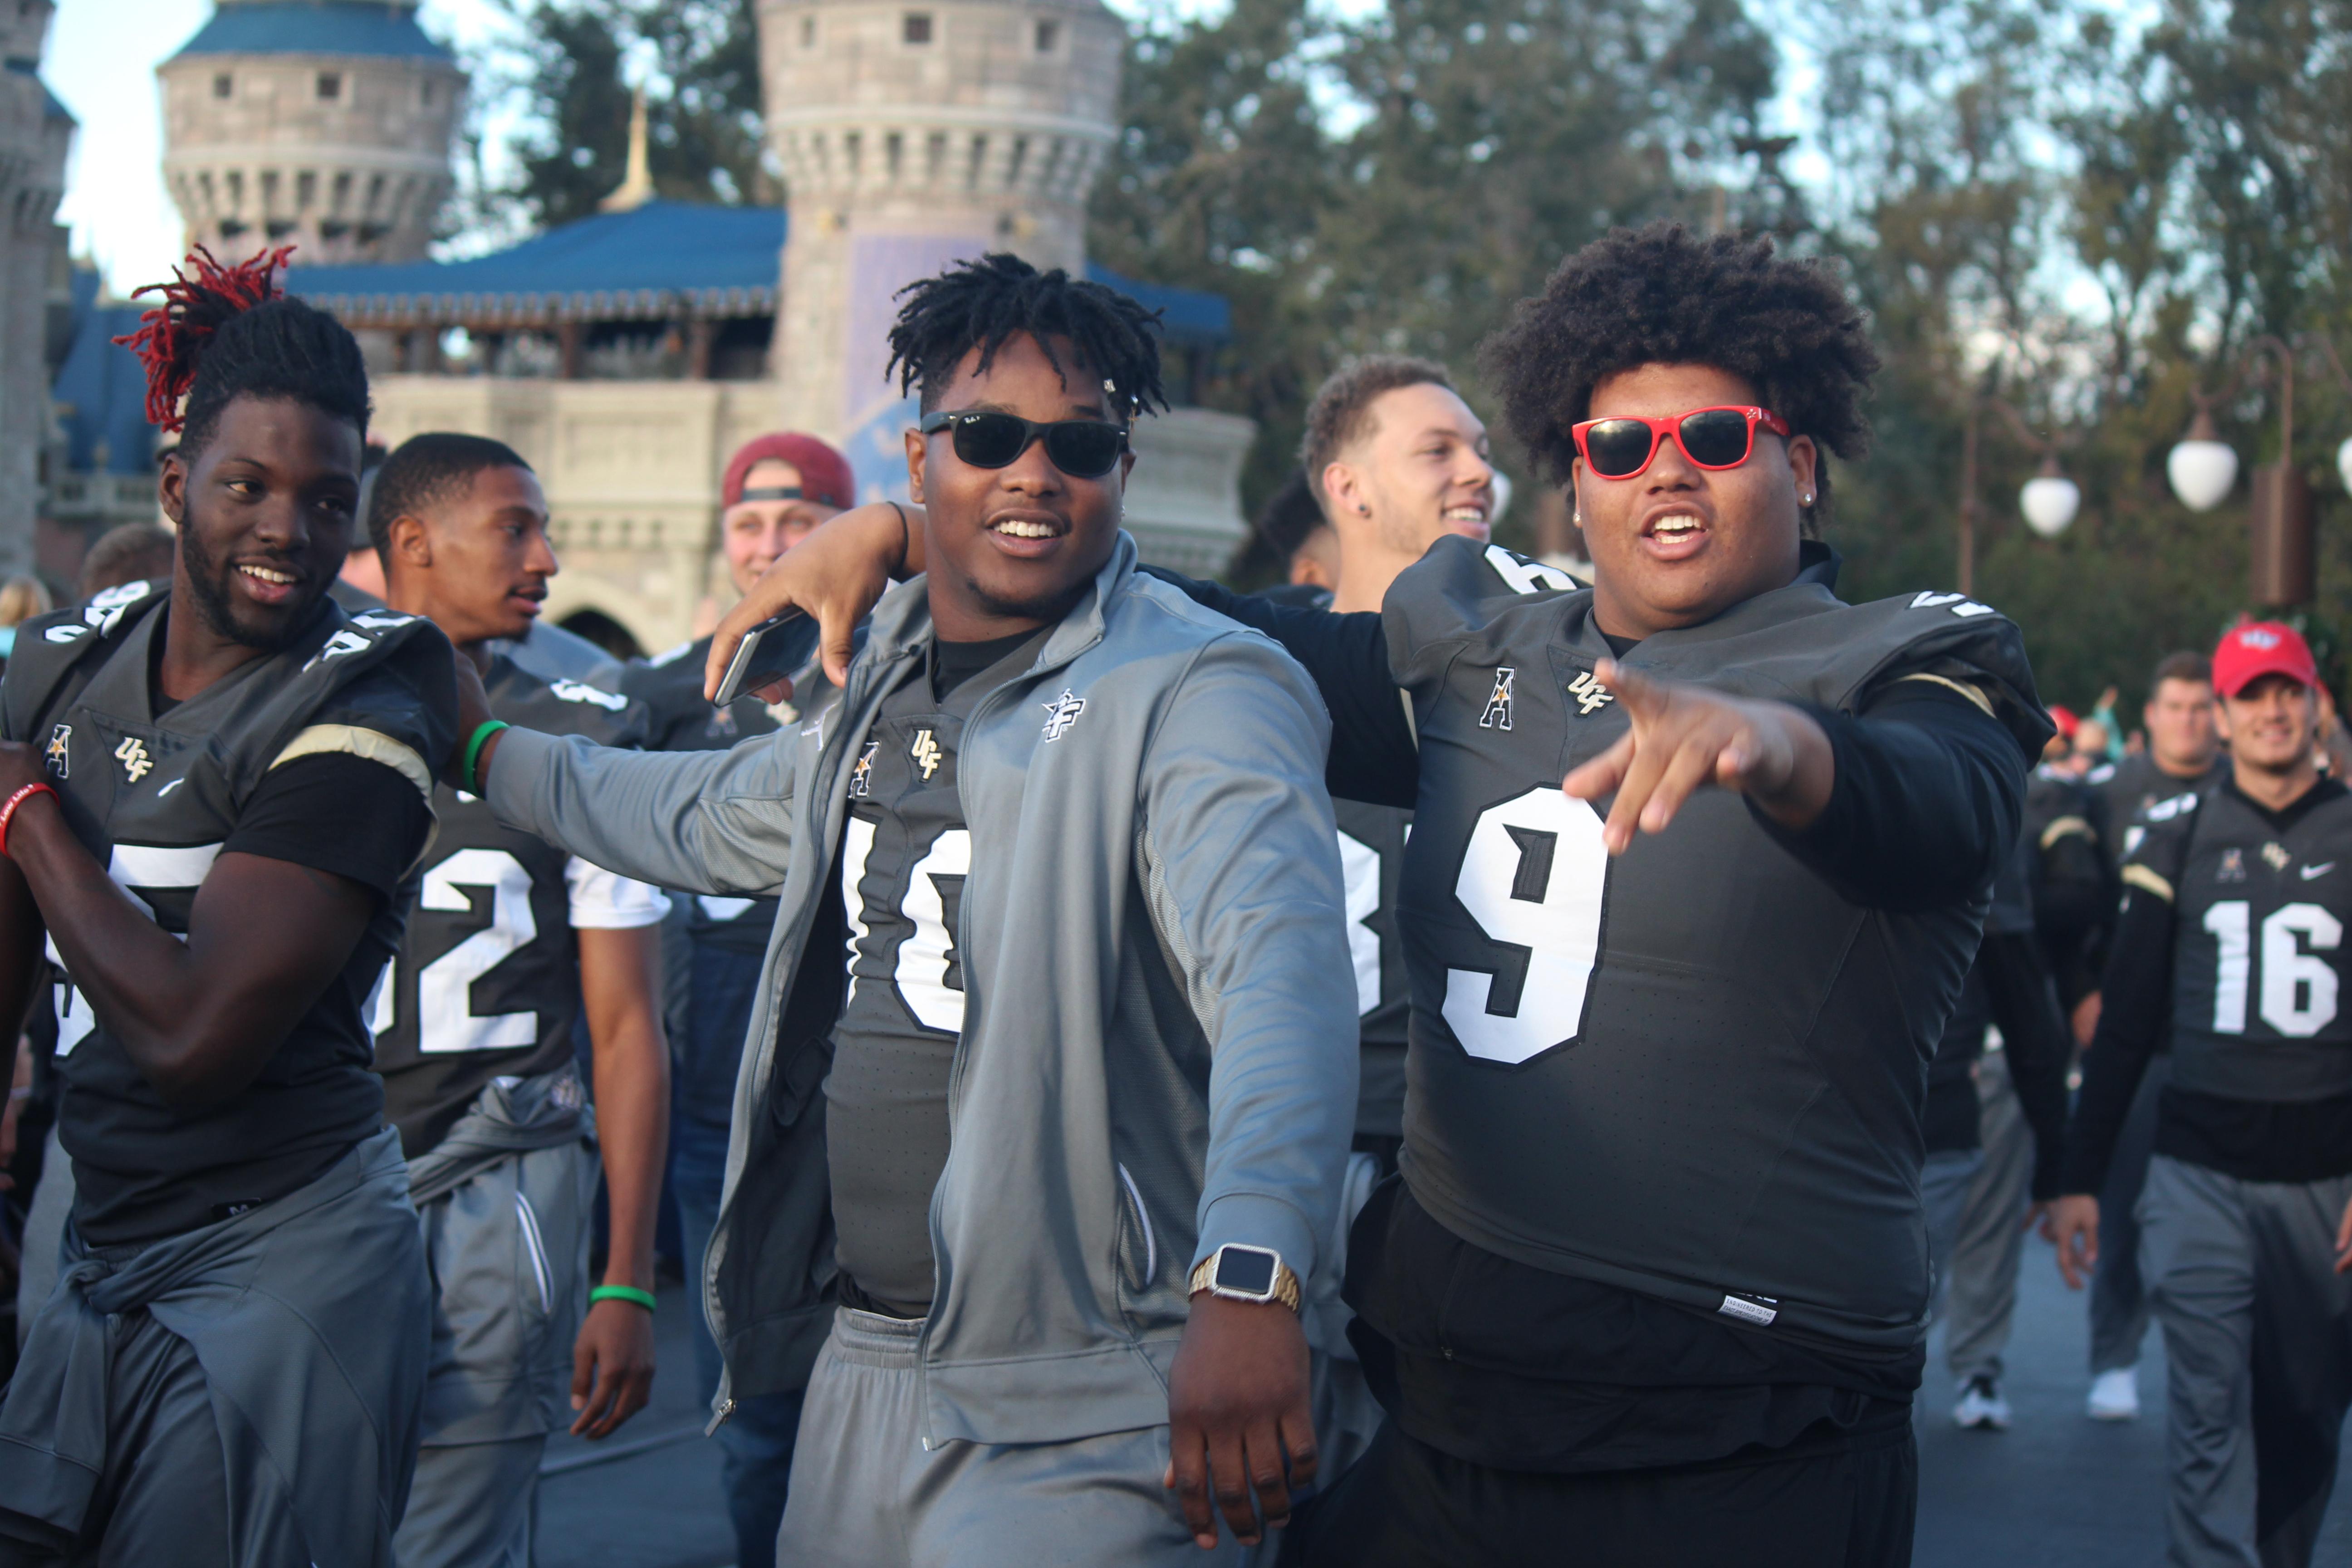 Gallery: UCF Football's Disney World Parade